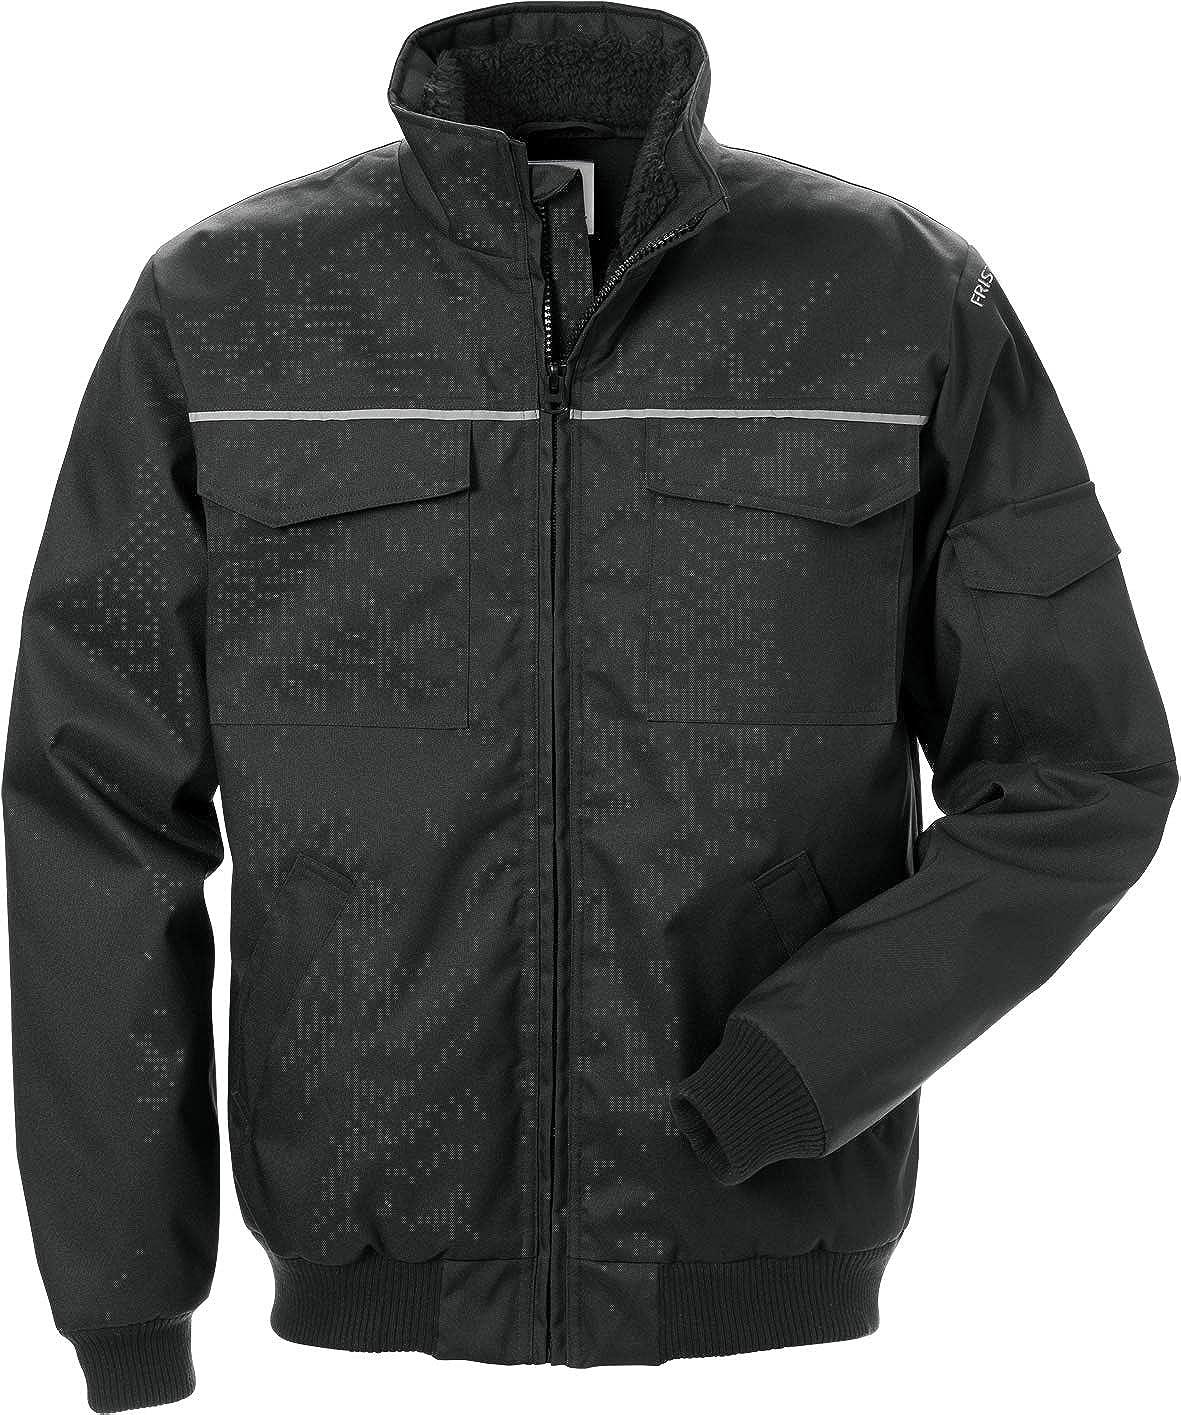 Fristads Workwear 127565 Mens Winter Jacket